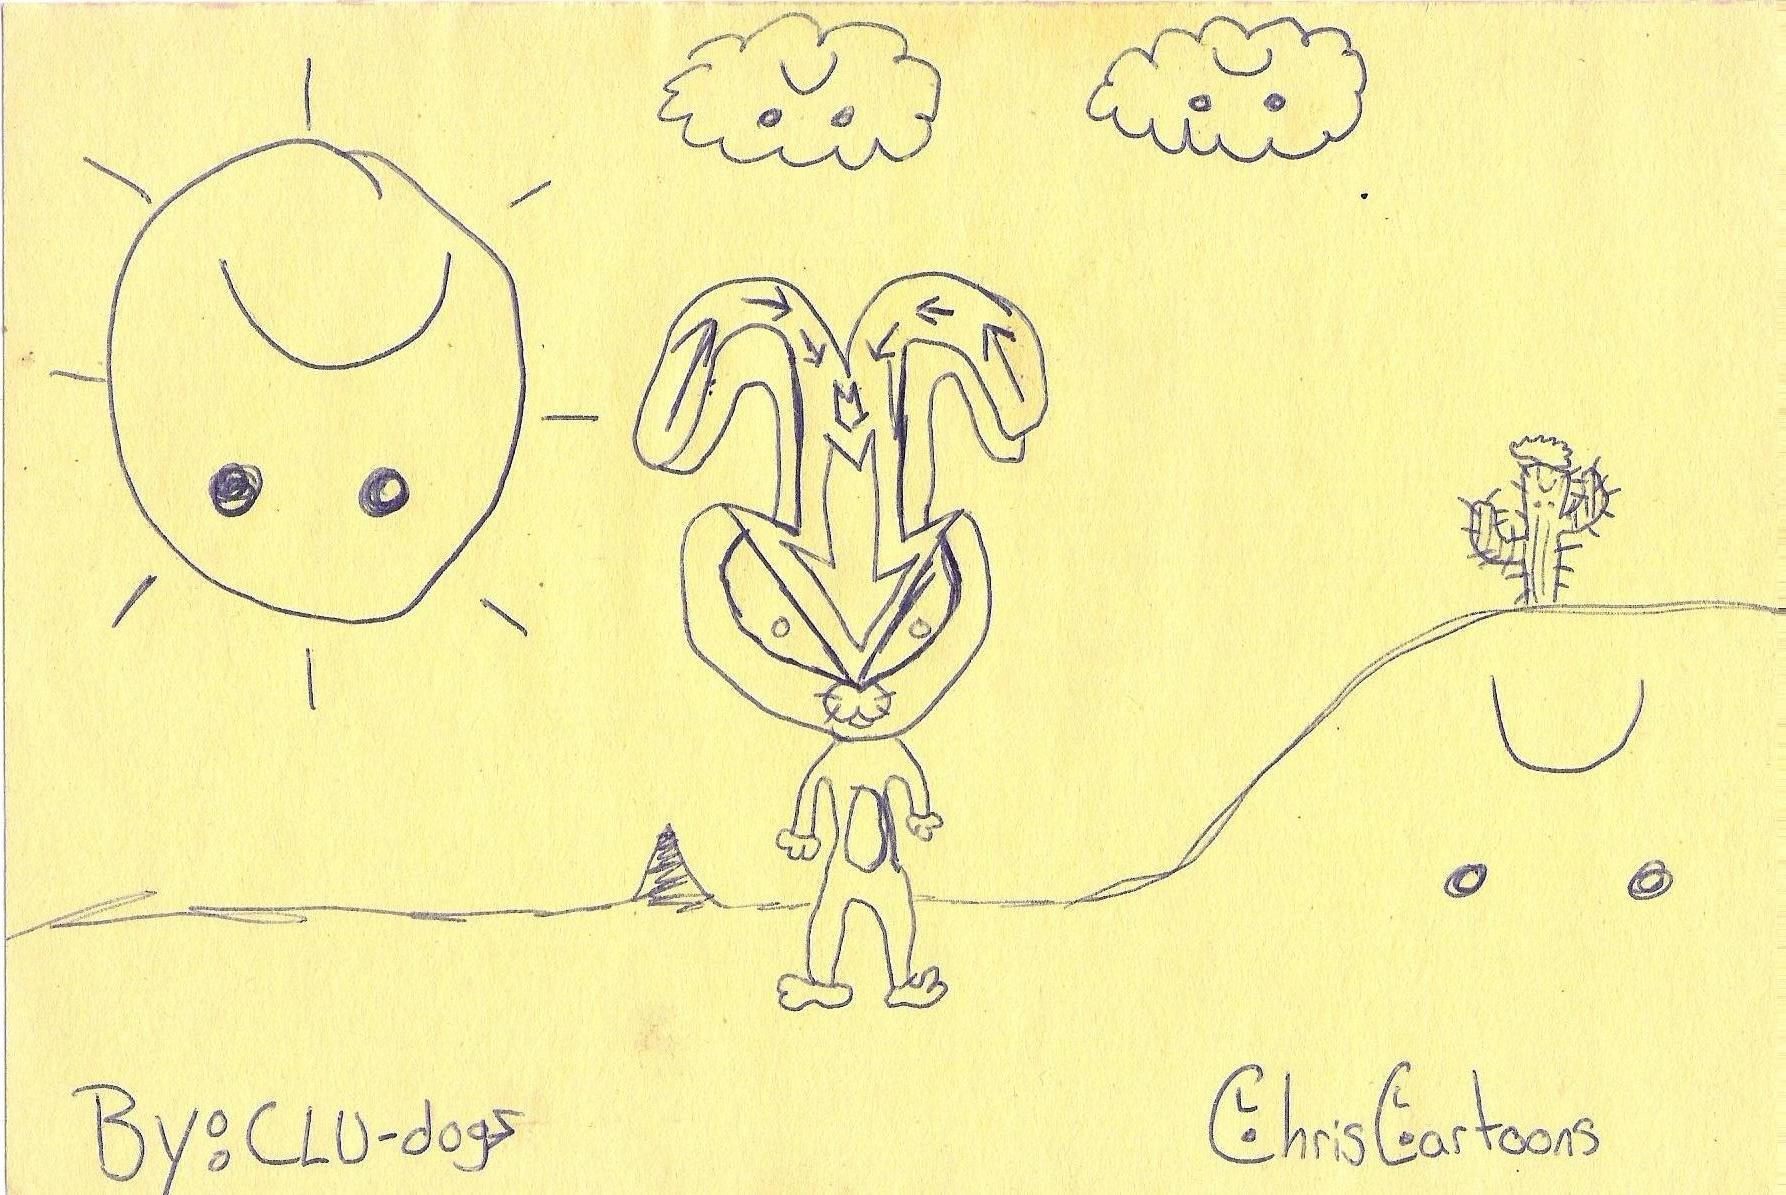 CLU Doodlez #2